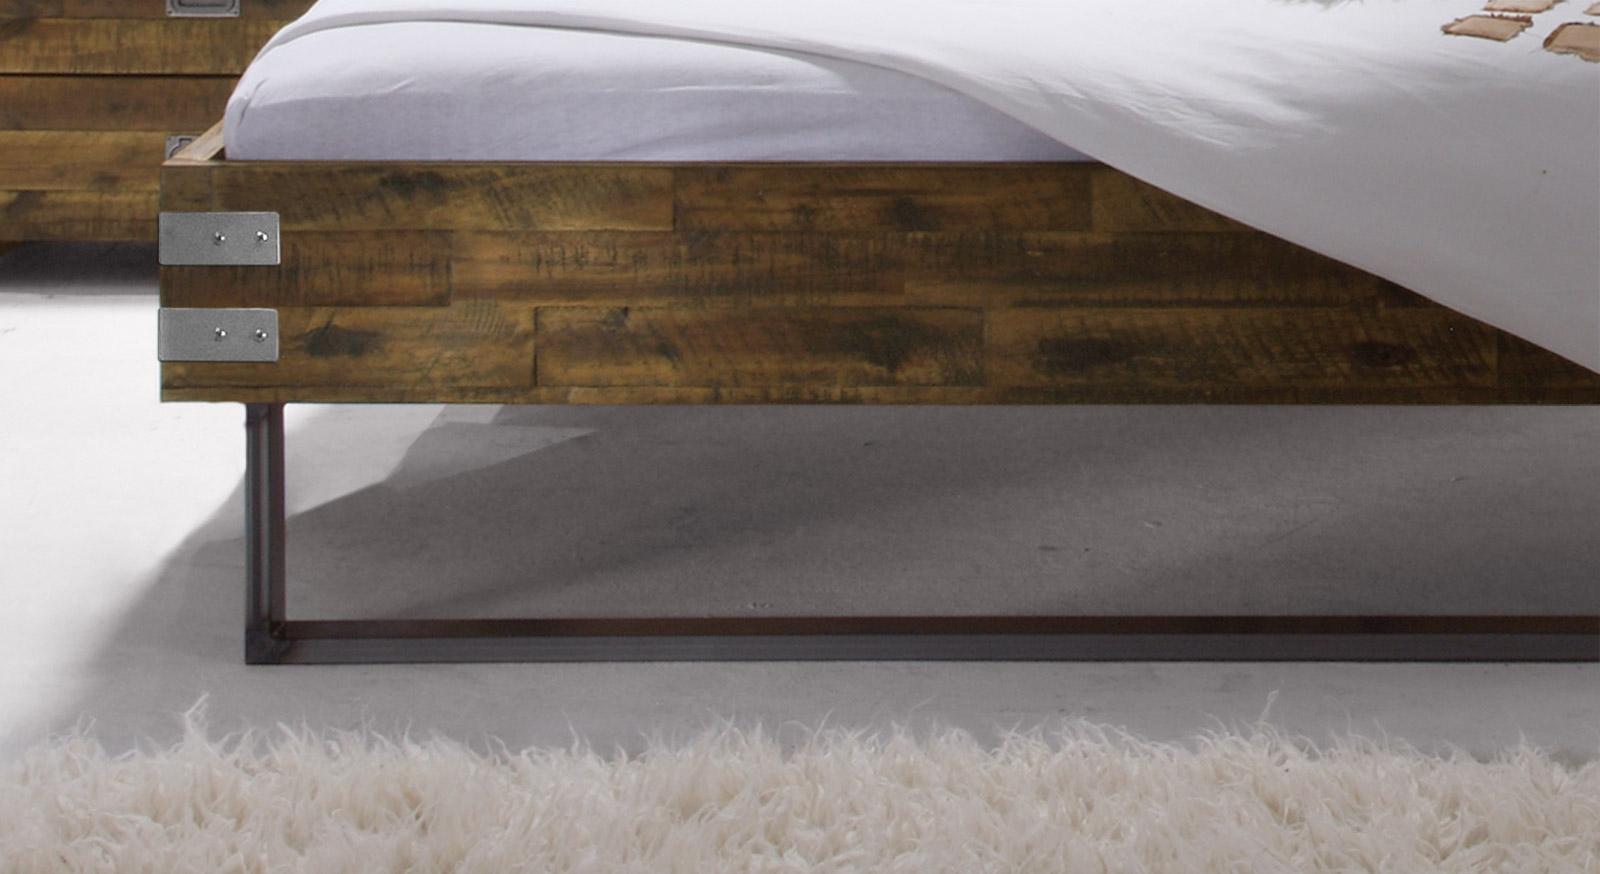 Stabiler Stahl-Fuss vom Bett Konna